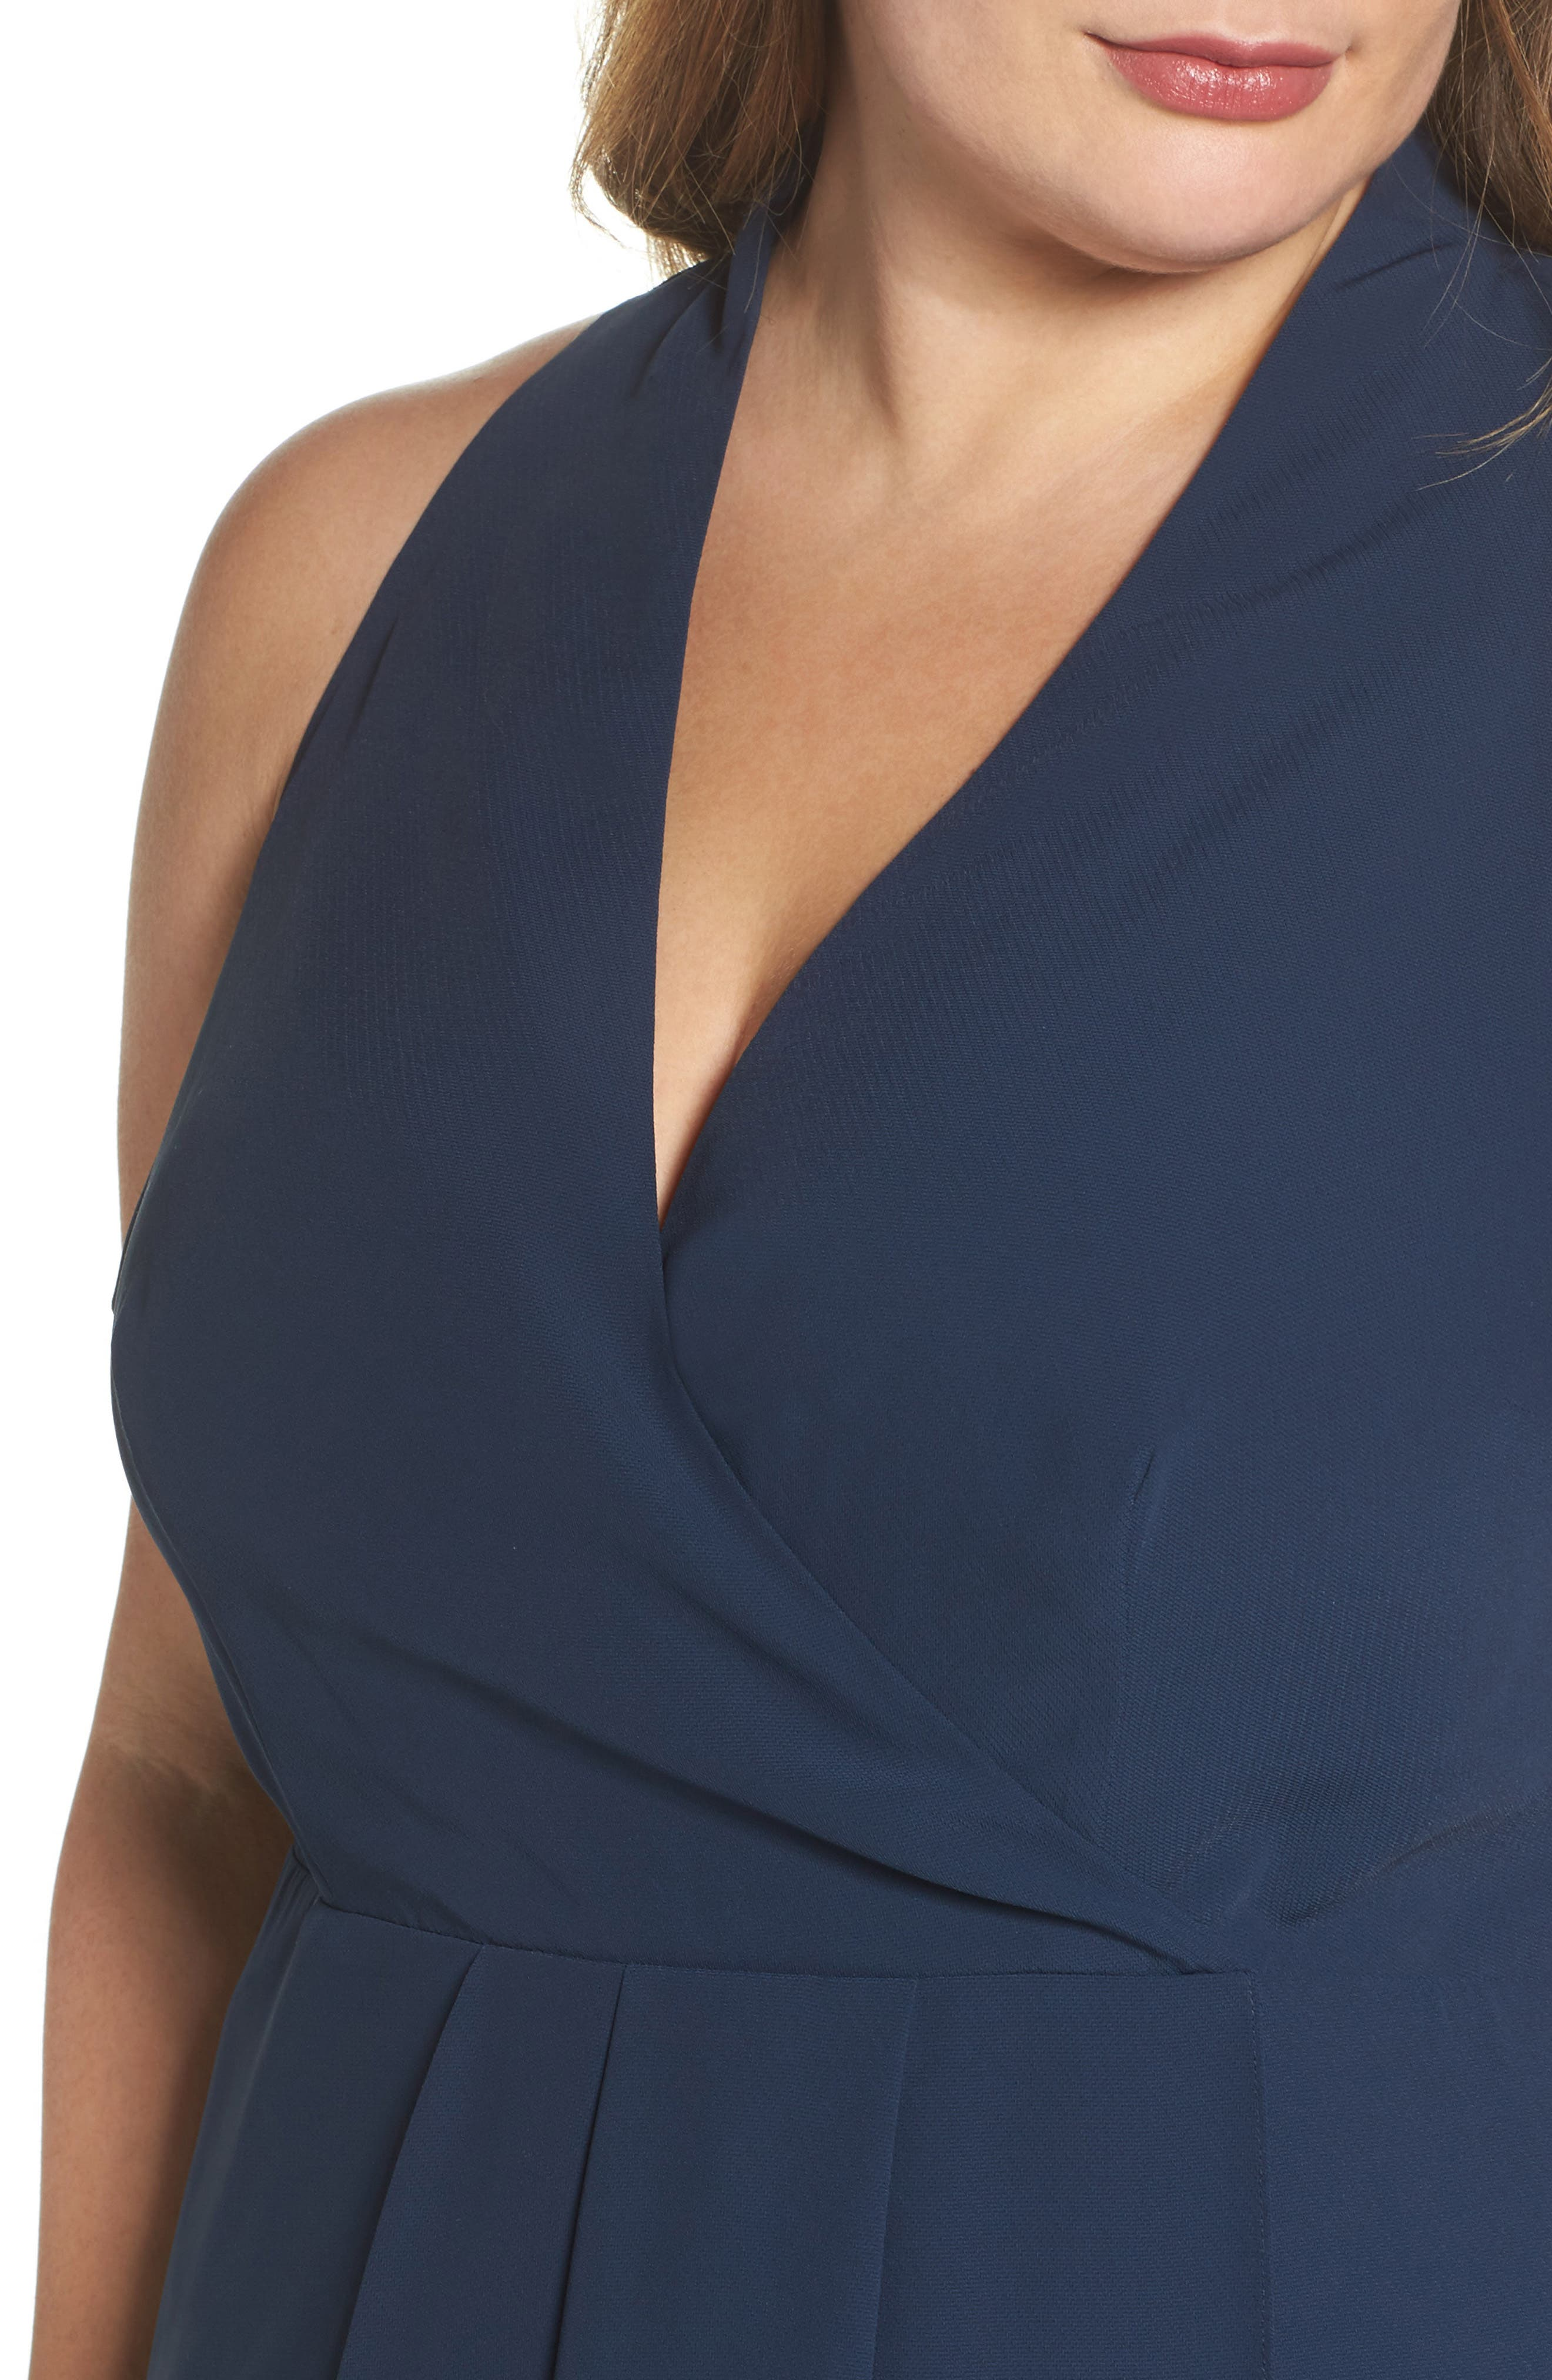 Evening Light Drape Dress,                             Alternate thumbnail 4, color,                             Iron Navy